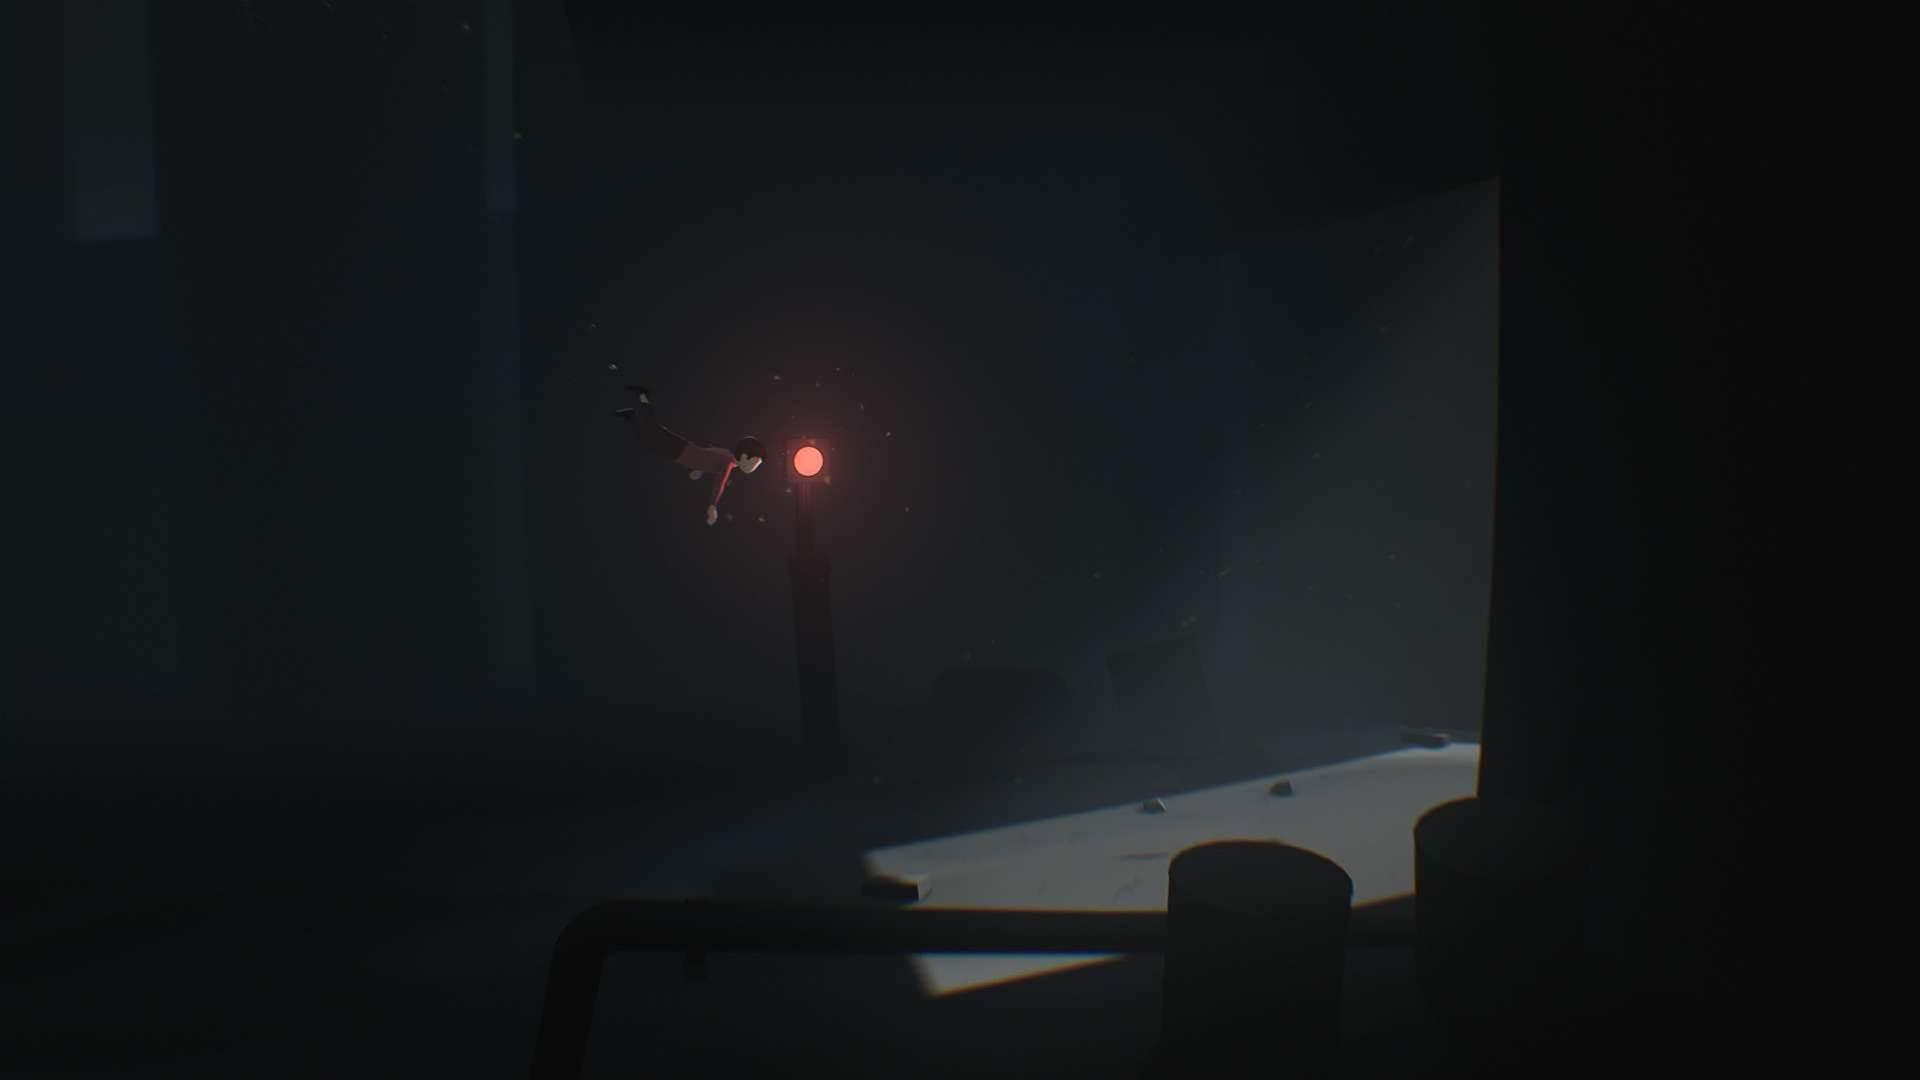 Moody screenshots from Playdead's Inside